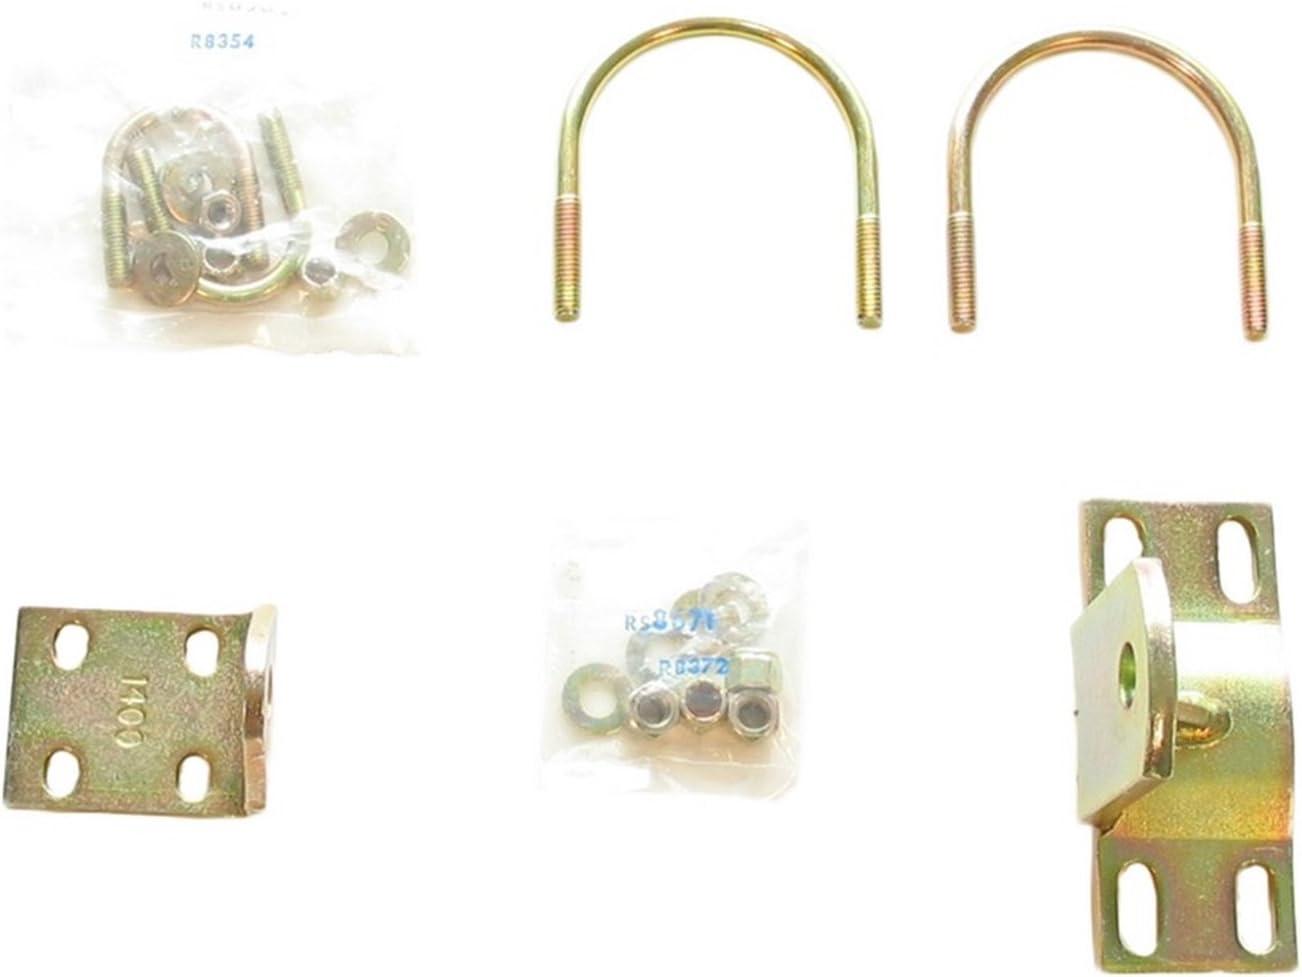 Rancho RS5545 Steering Stabilizer Bracket Kit